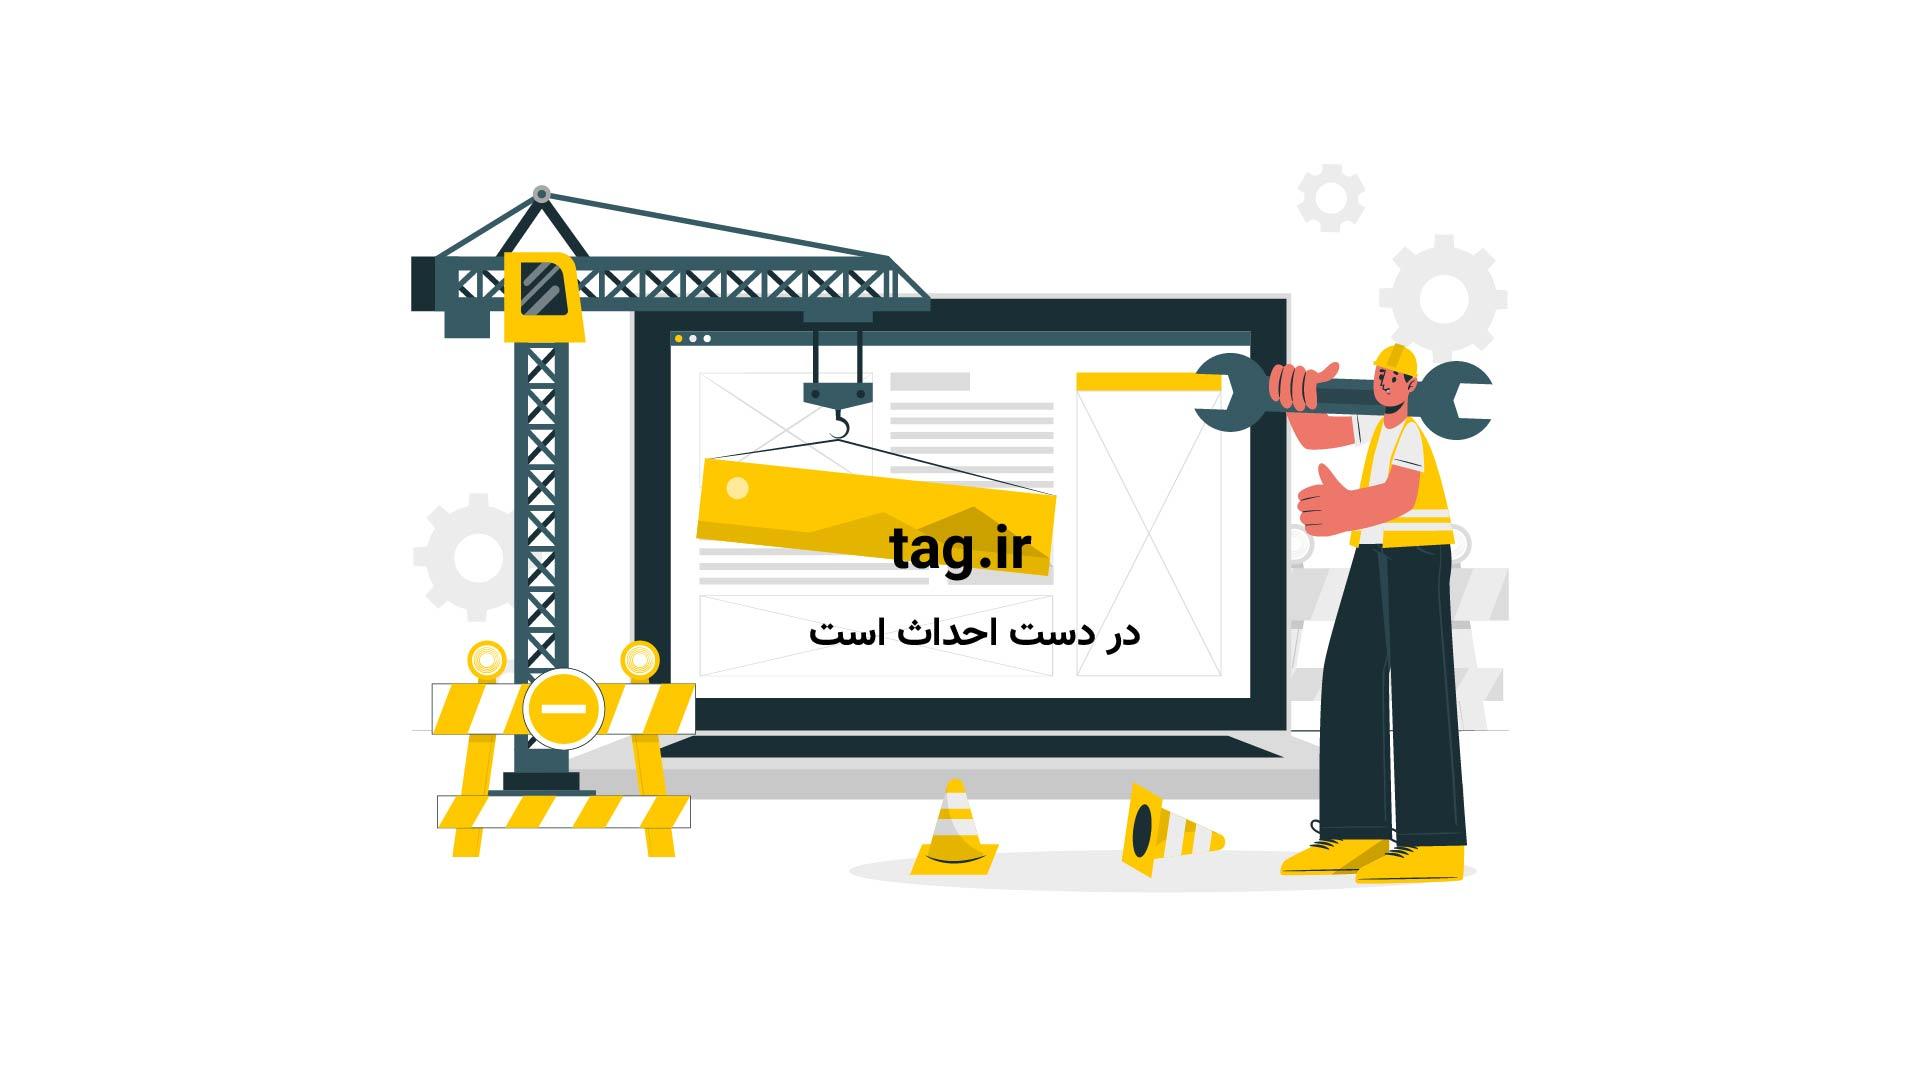 کوره خورشیدی | تگ